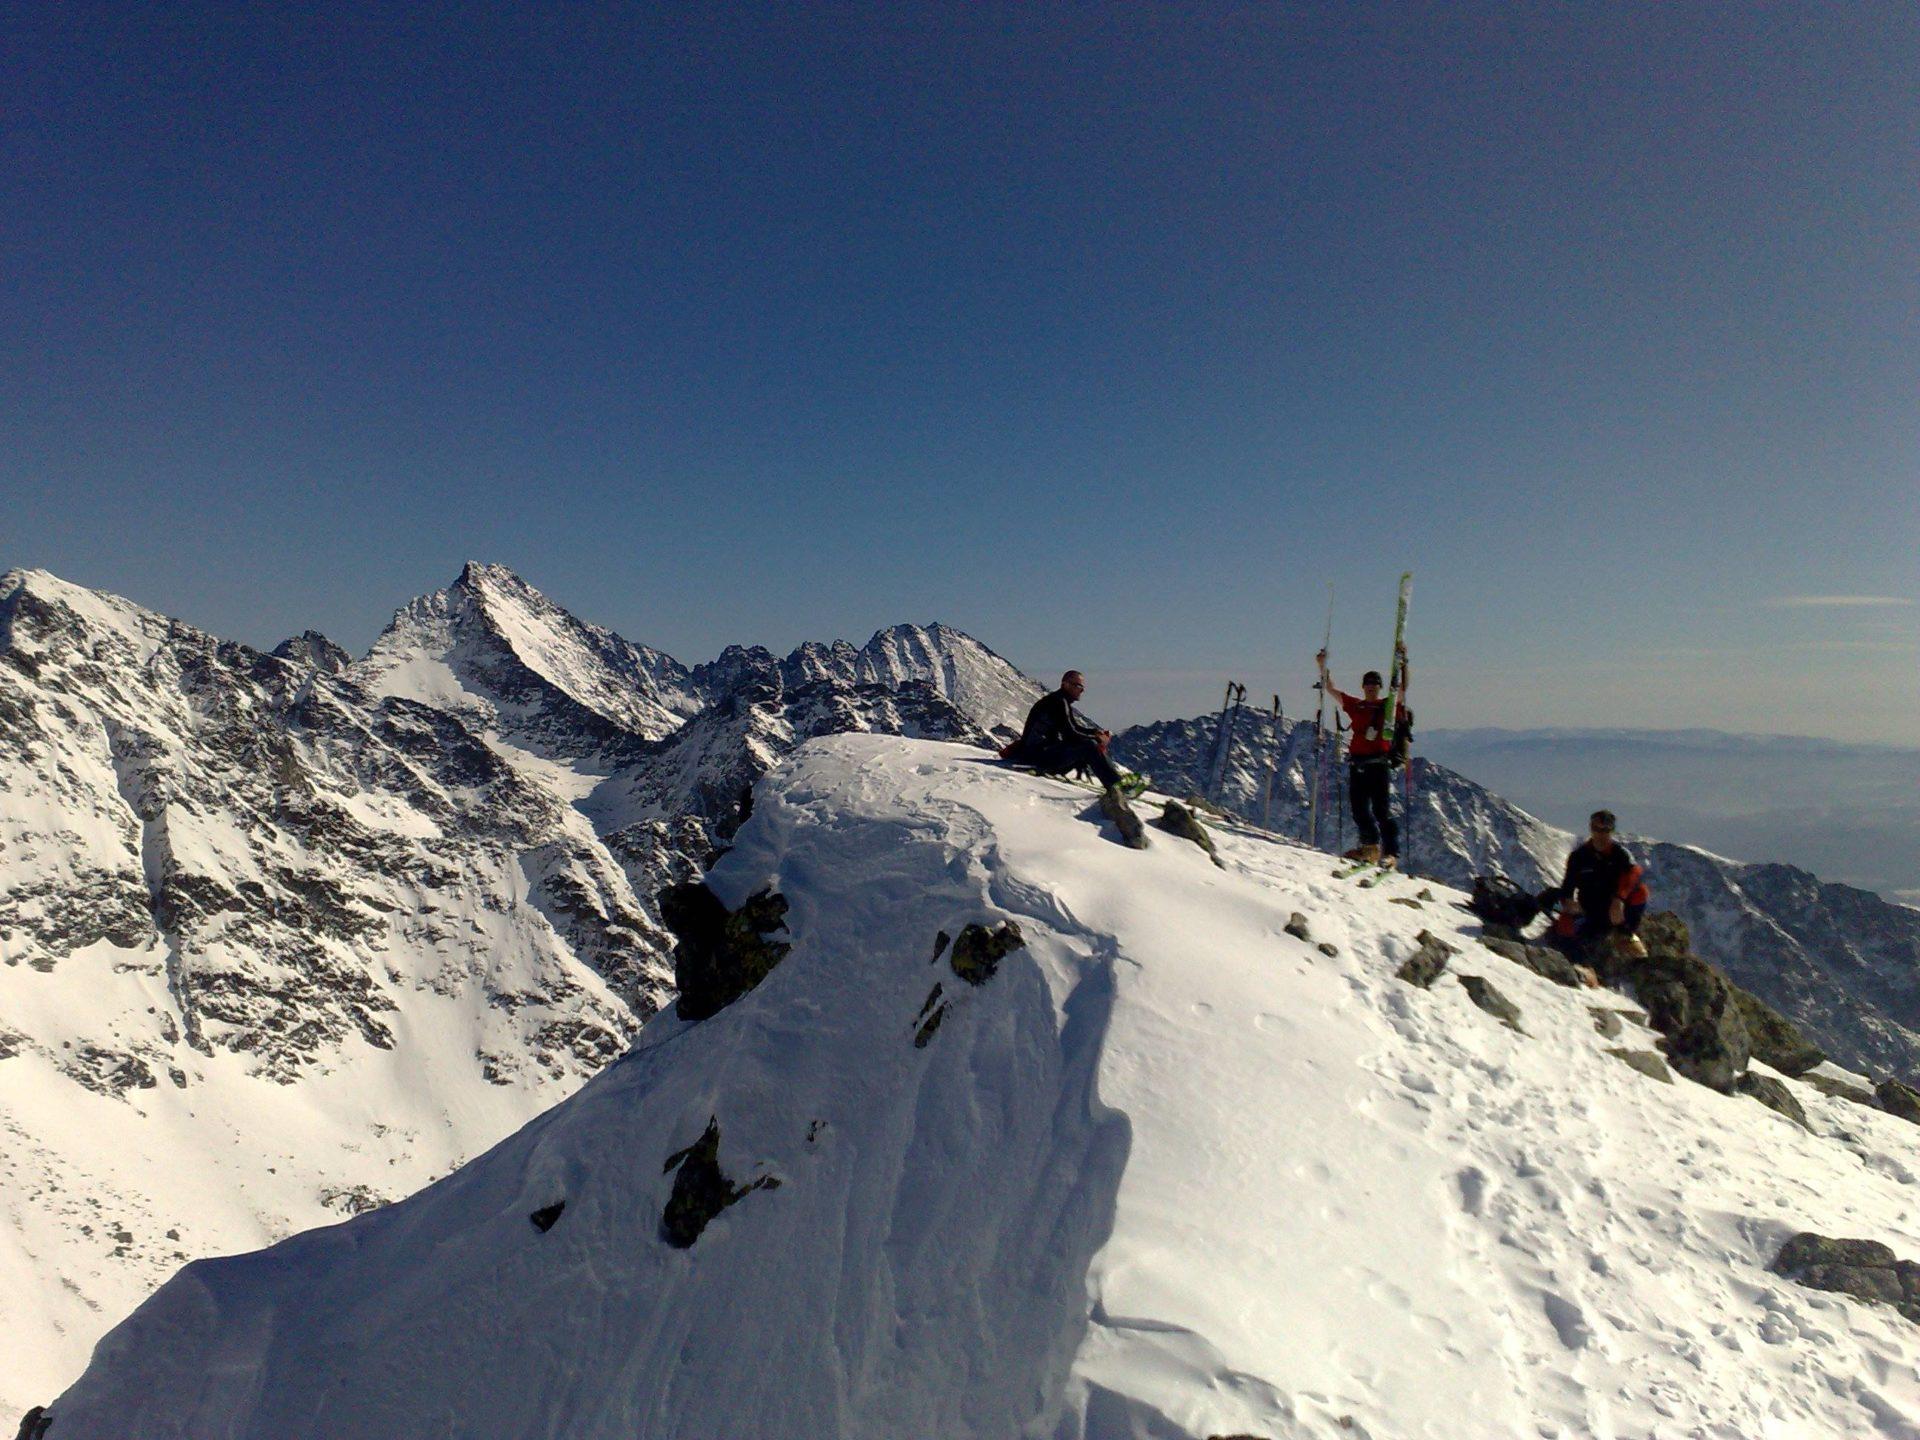 High Tatras ski touring days from Popradske Lake